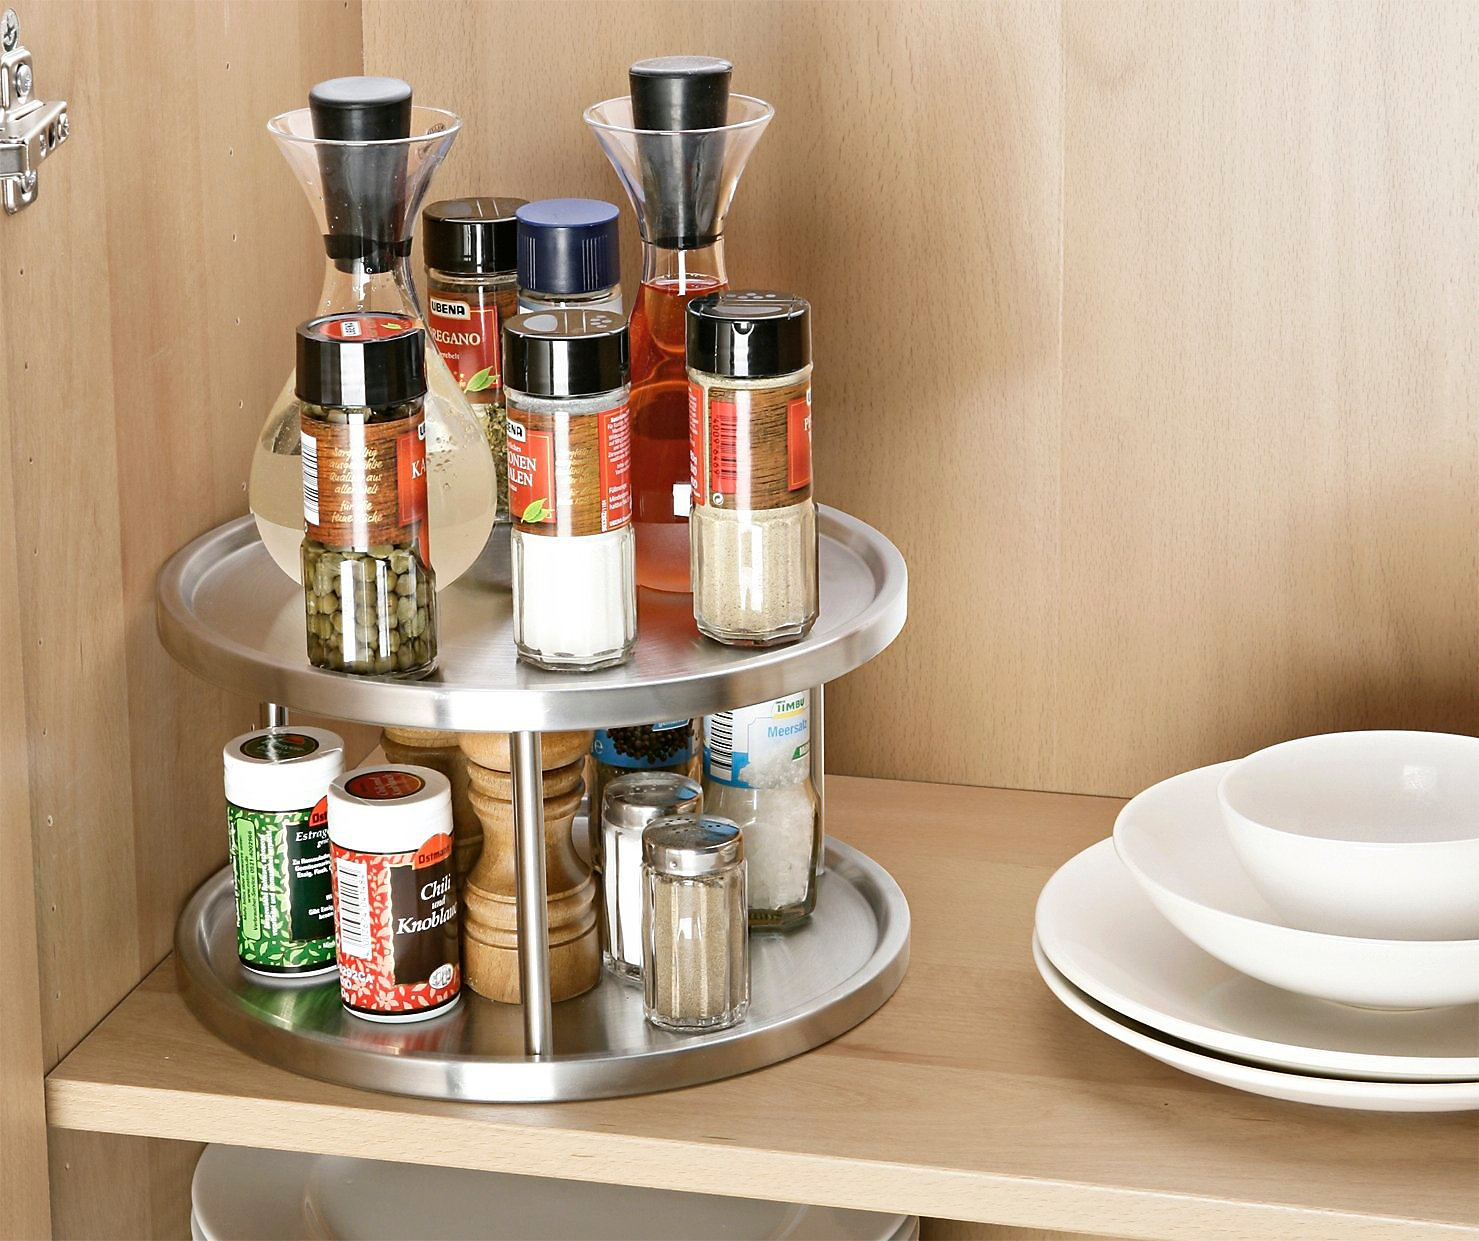 Küchen-Karussel Edelstahl DUO jetzt bei Weltbild.de bestellen